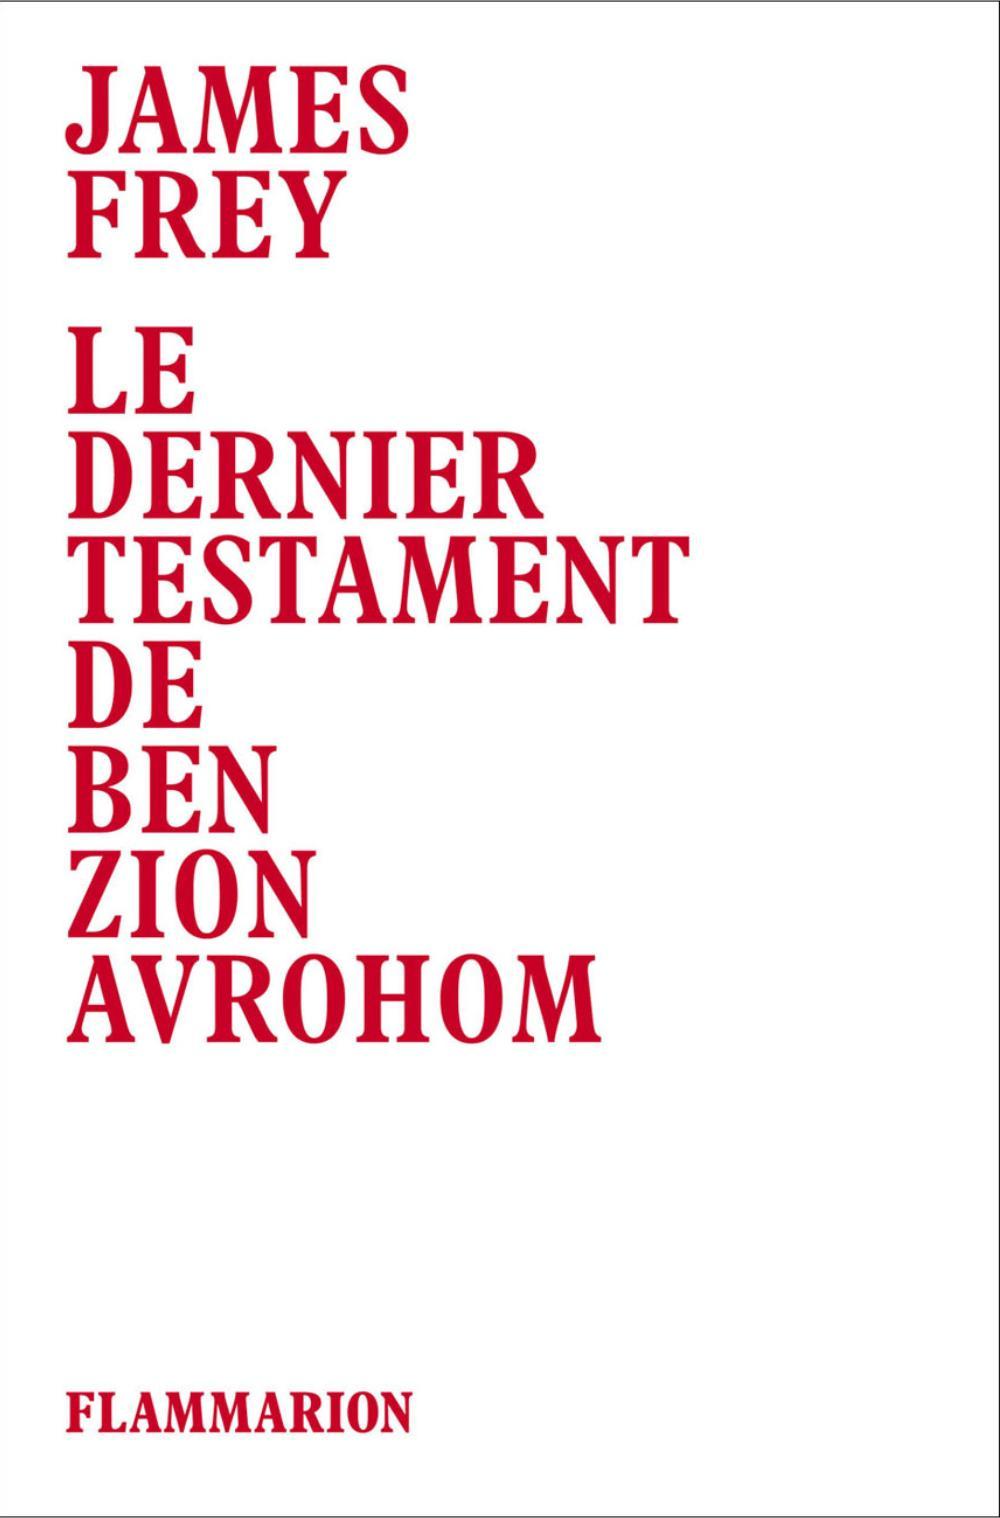 Le dernier testament de Ben Zion Avrohom